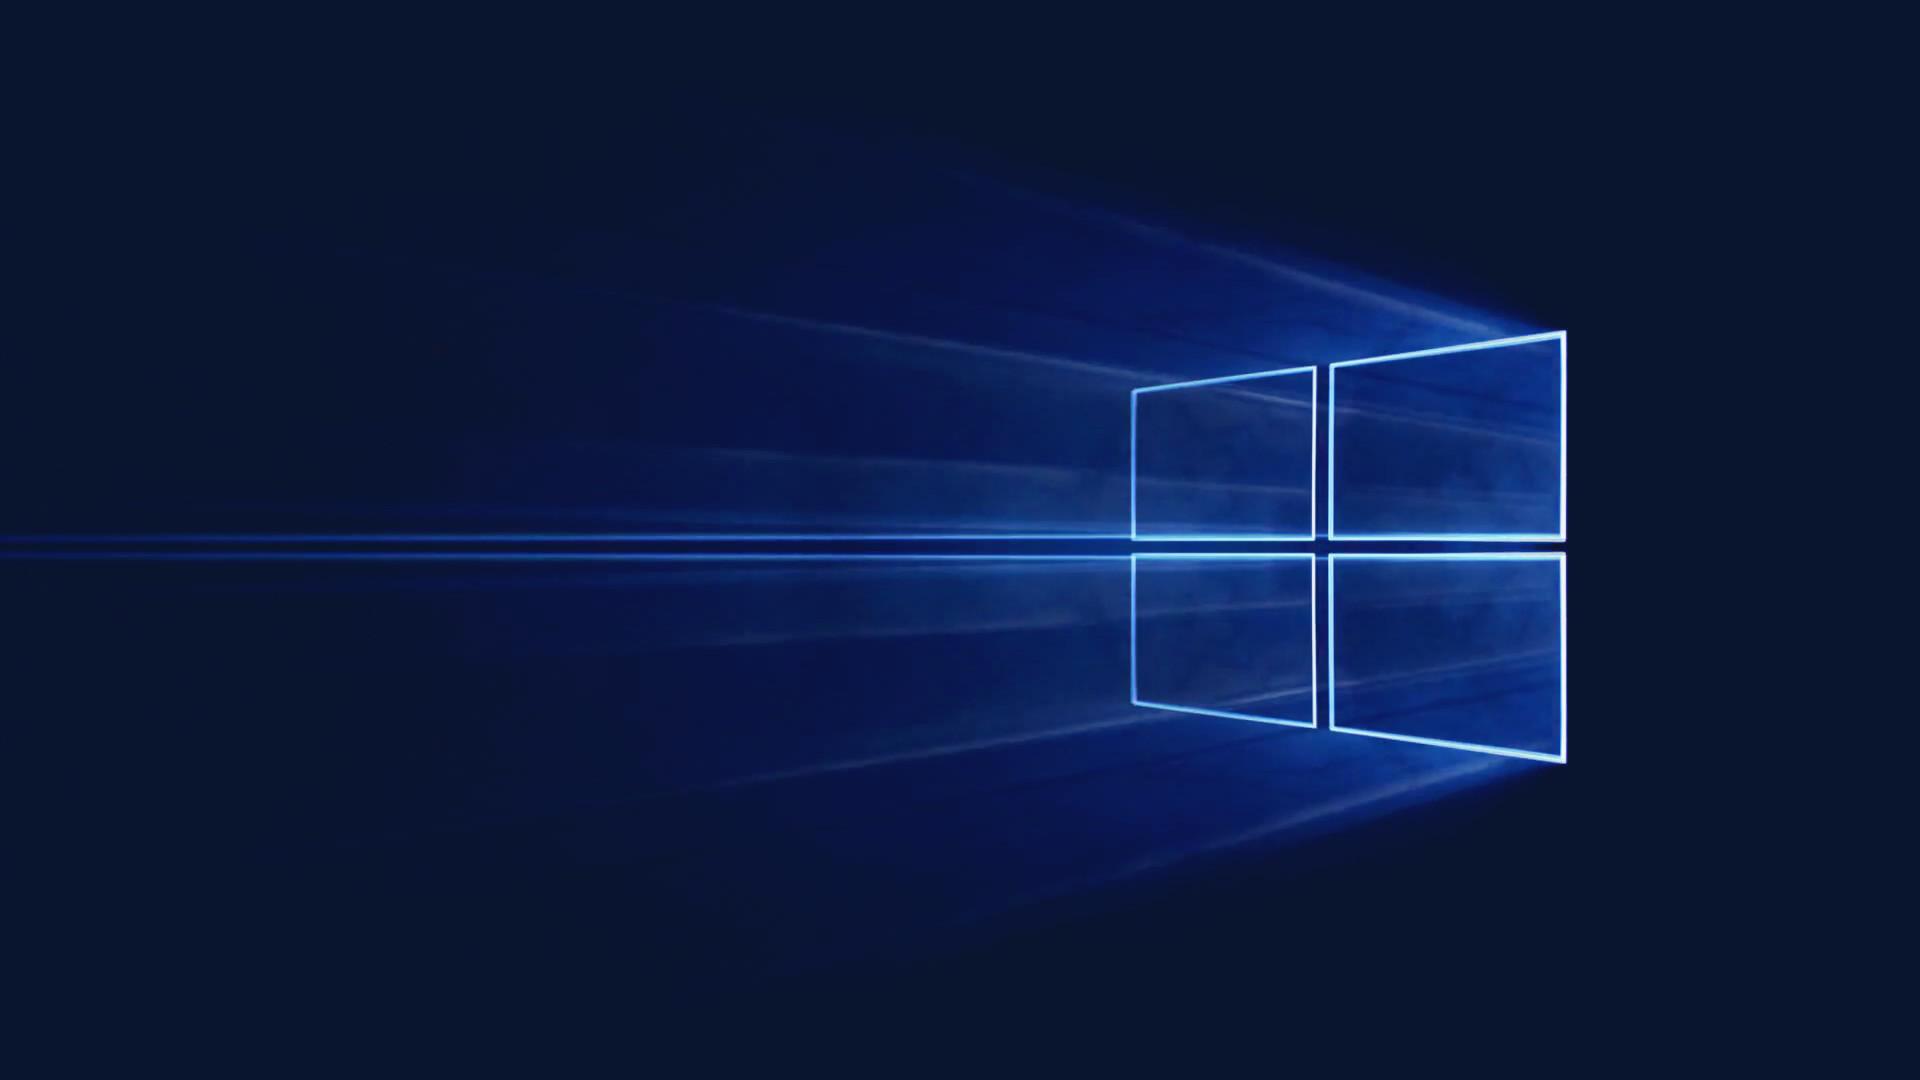 Sfondi Windows 10 4k 62 Immagini